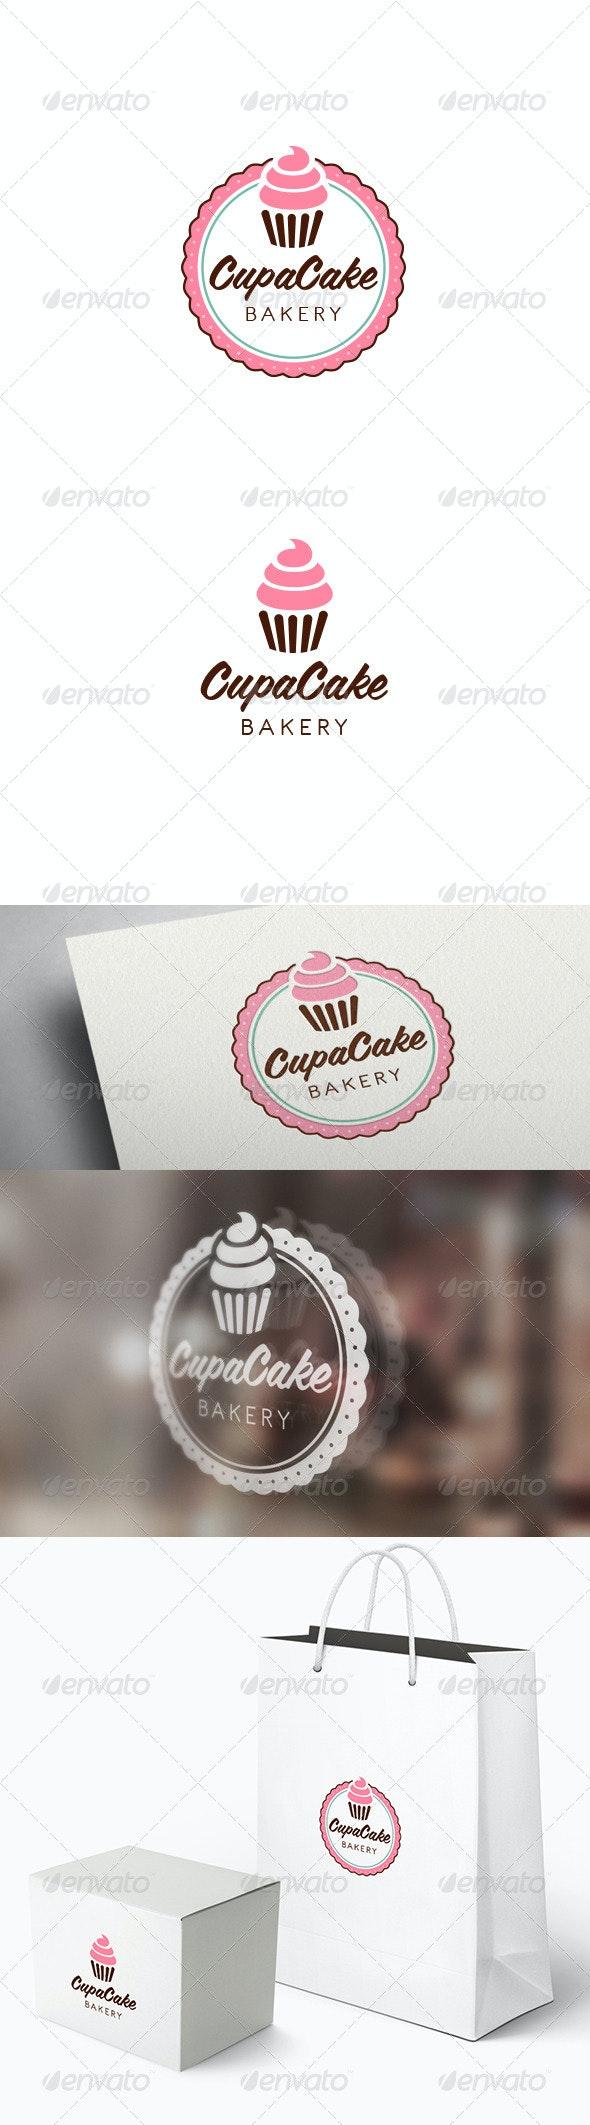 Cupacake Logo Template - Food Logo Templates